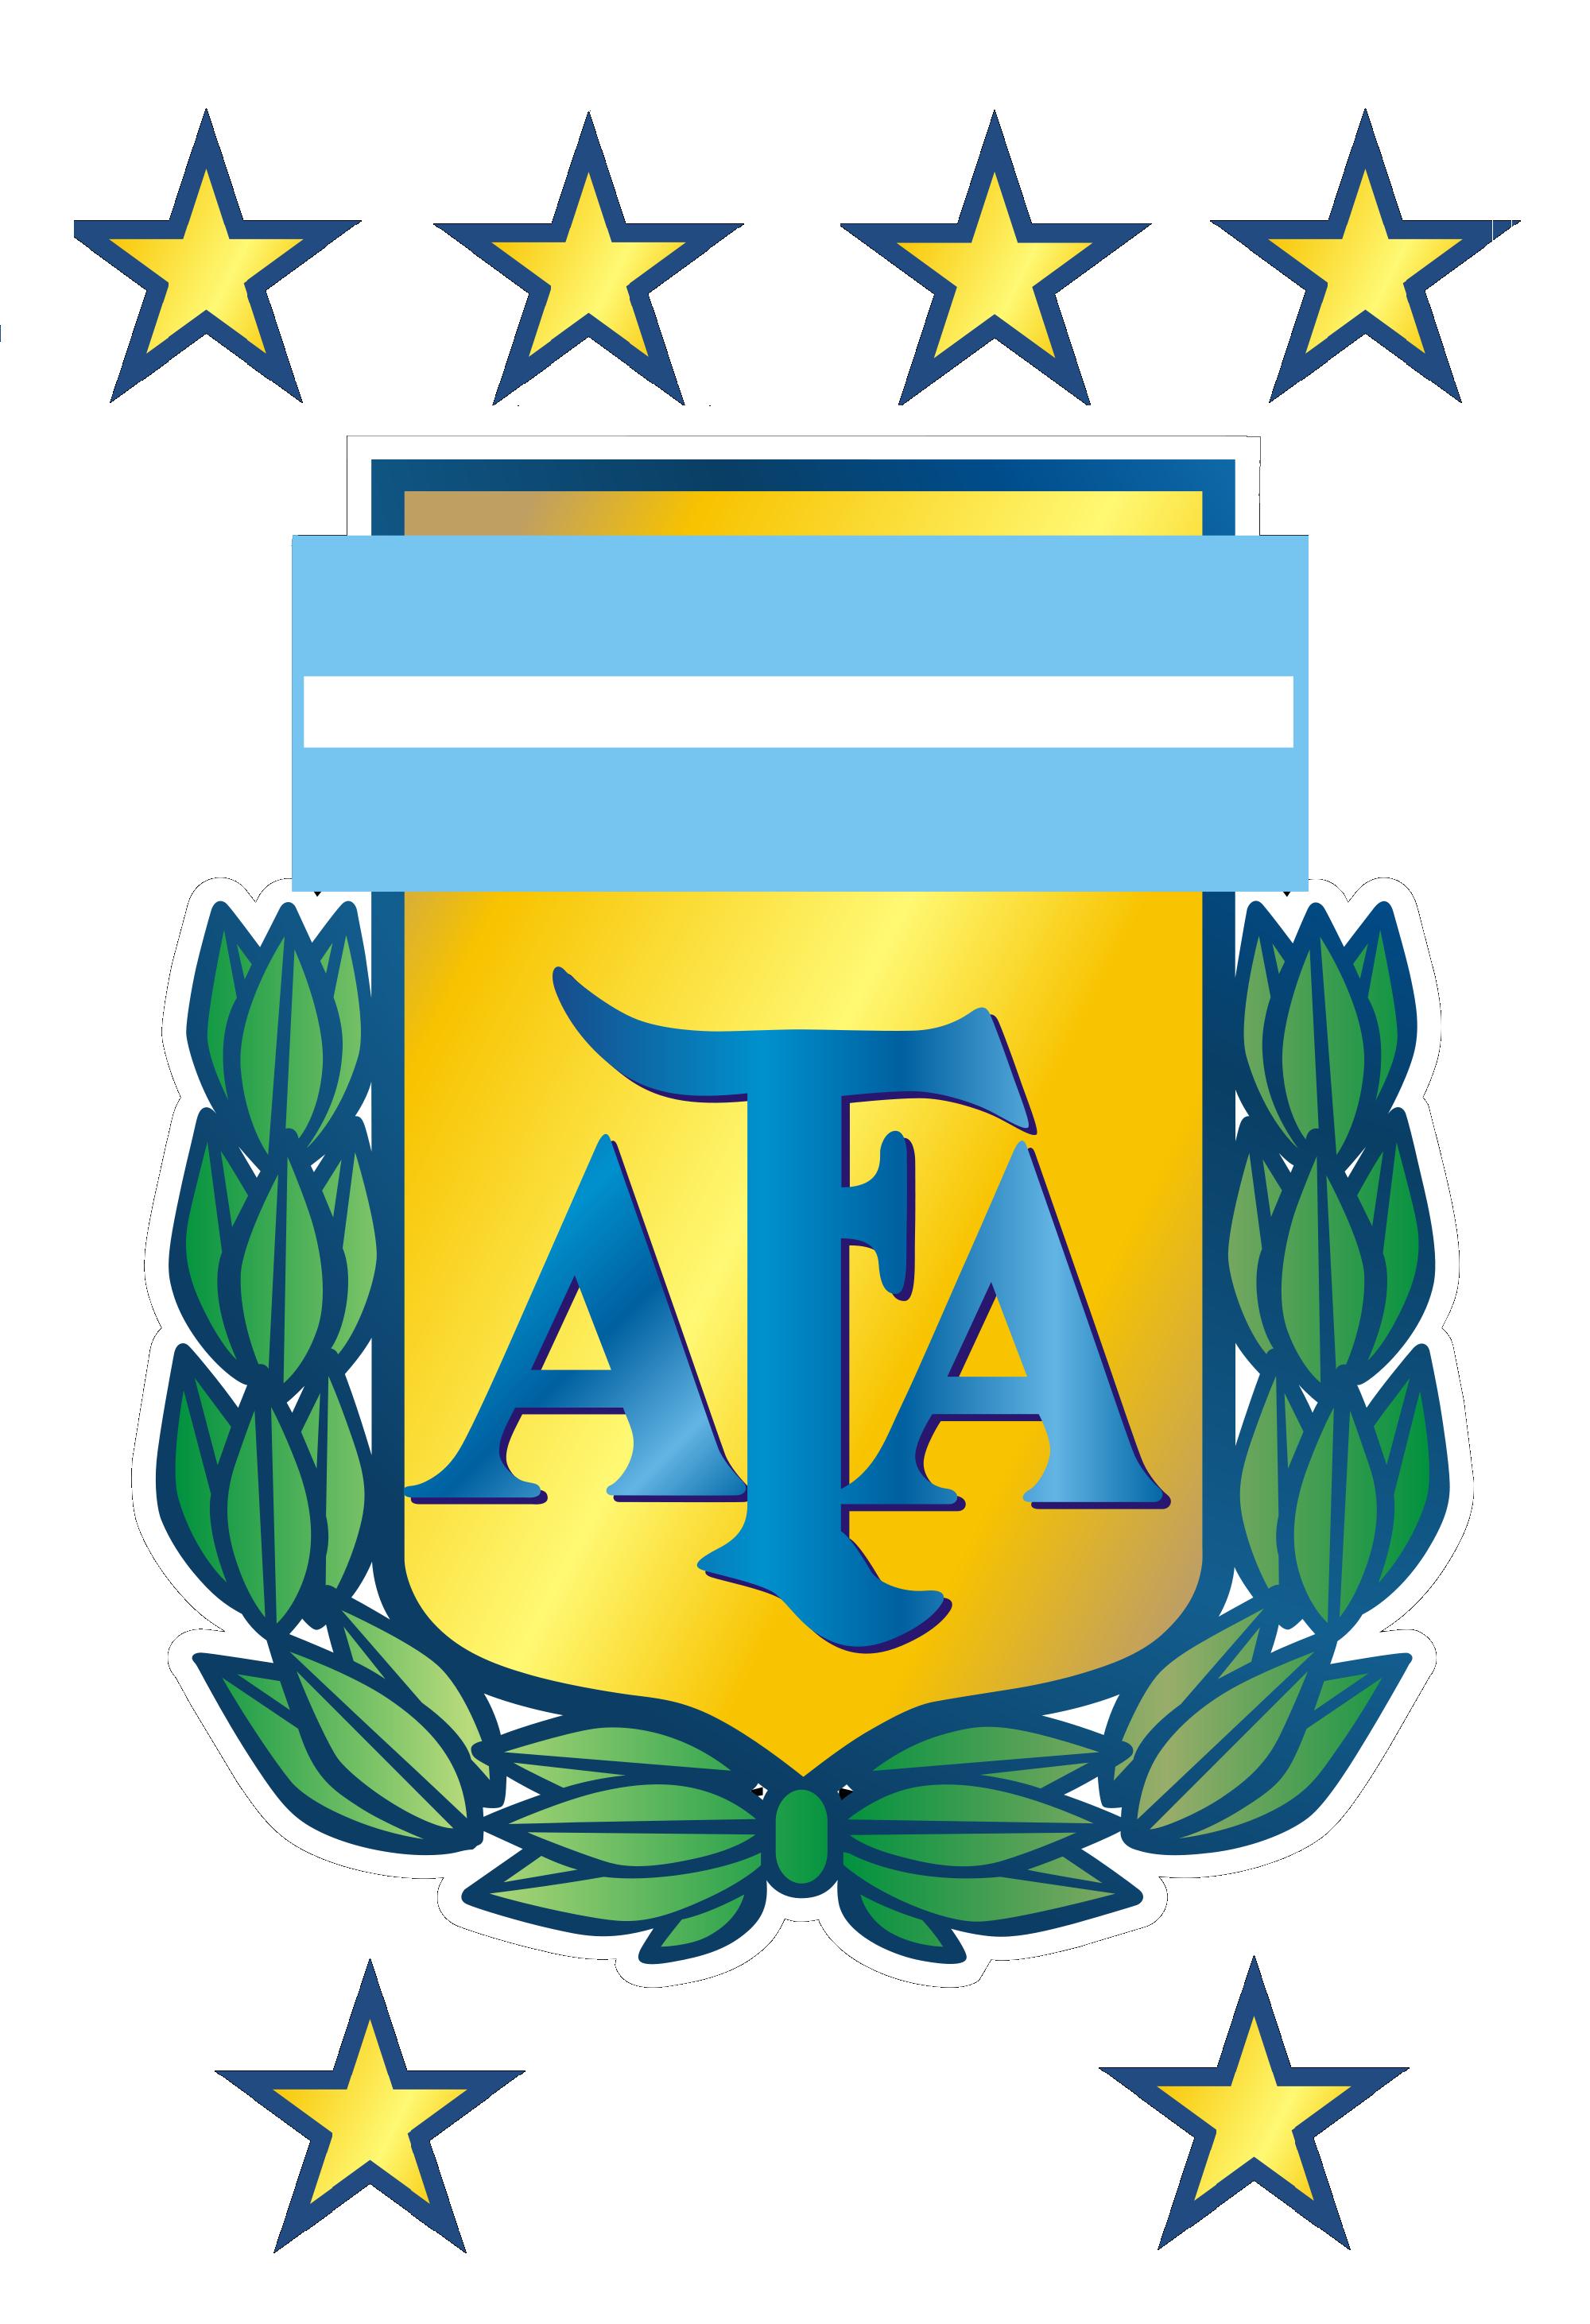 Afa Team Logo PNG Transparent Afa Team Logo.PNG Images..